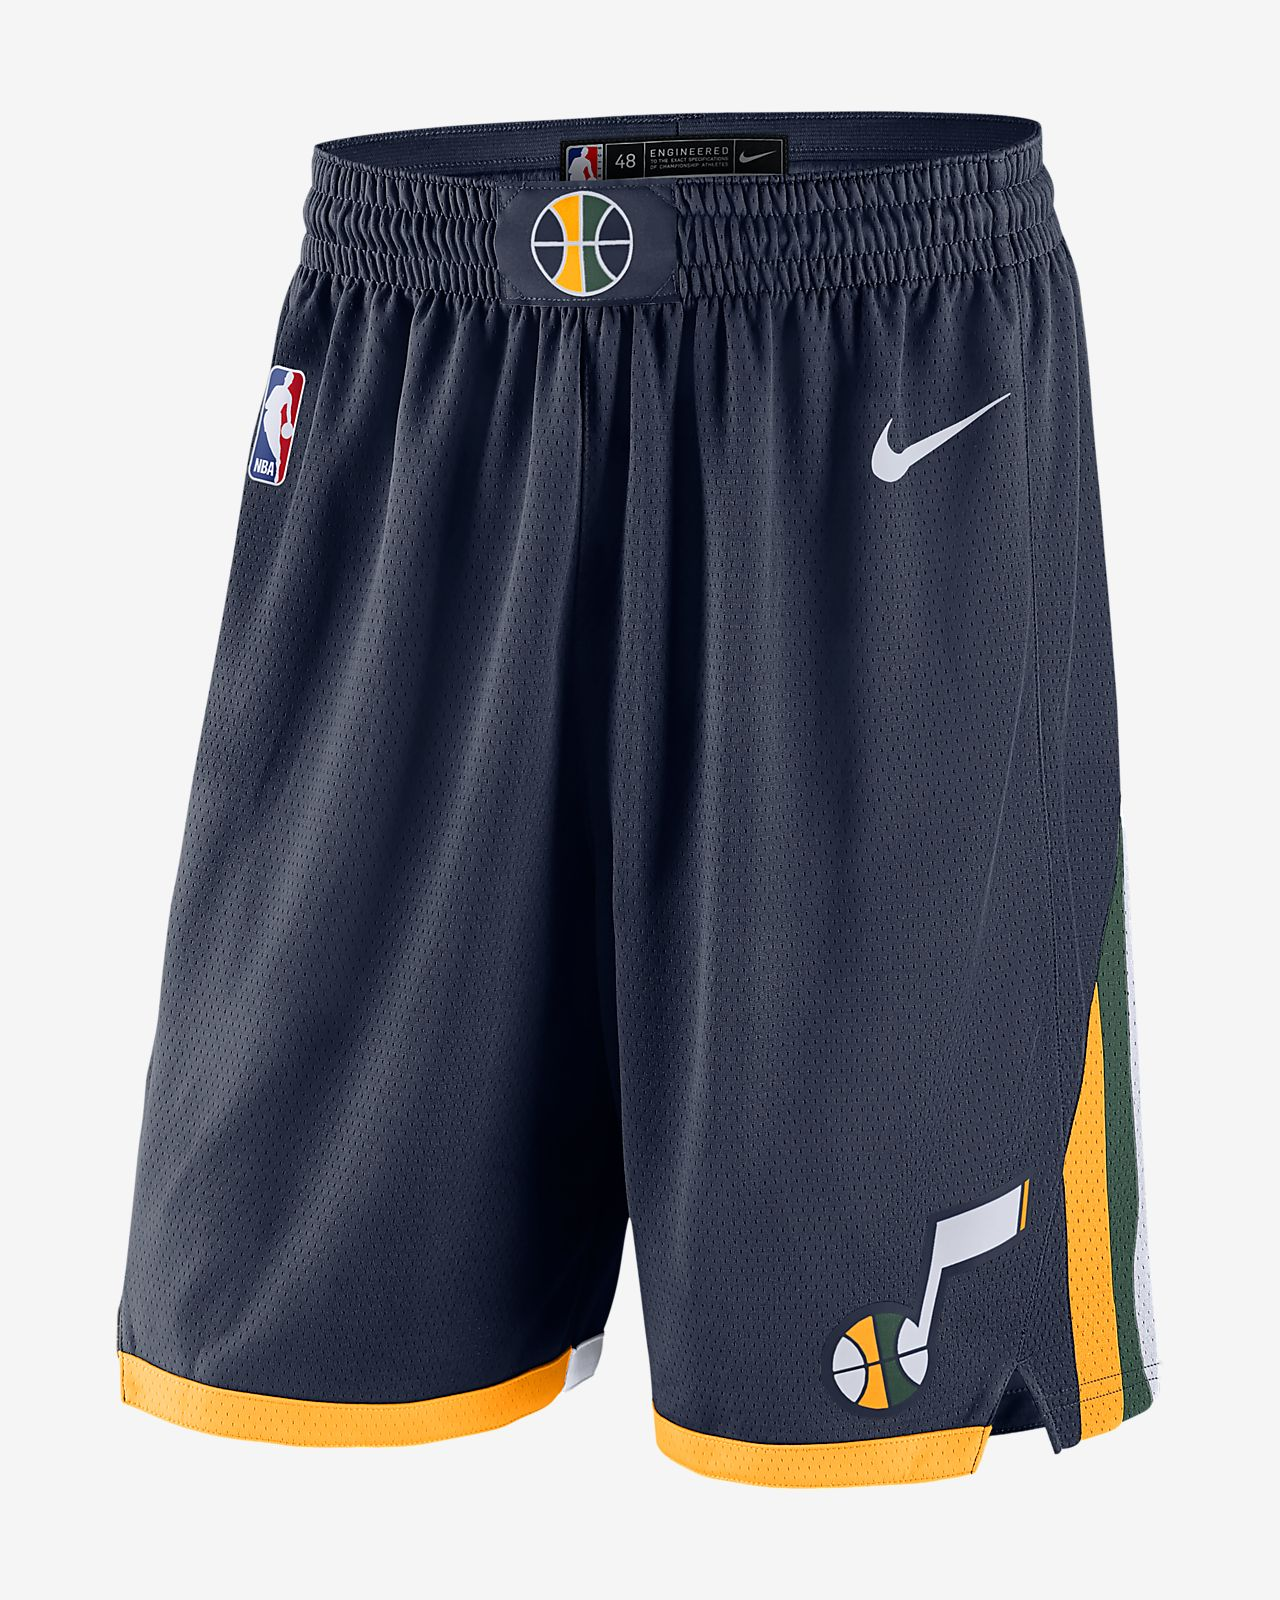 a7f2c44f3ef Utah Jazz Icon Edition Swingman Men s Nike NBA Shorts. Nike.com ZA